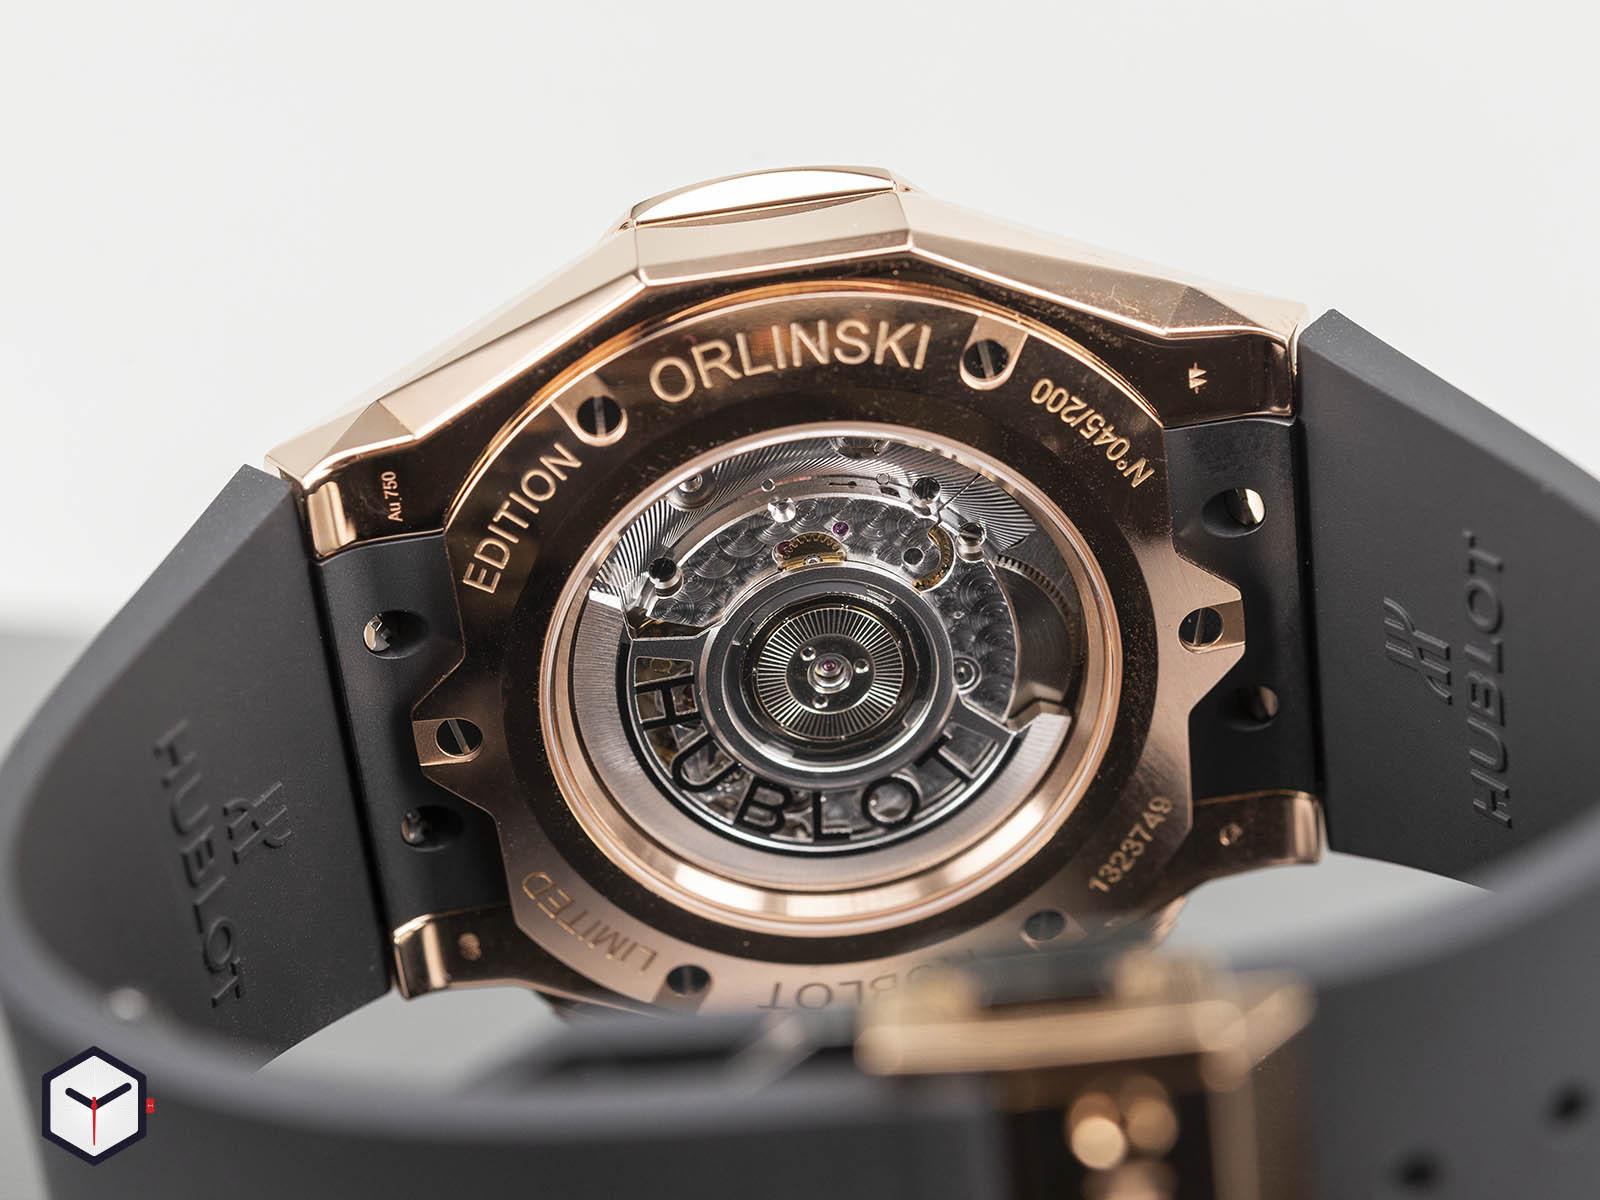 525-ox-0180-rx-orl18-hublot-classic-fusion-aerofusion-chronograph-orlinski-king-gold-5.jpg